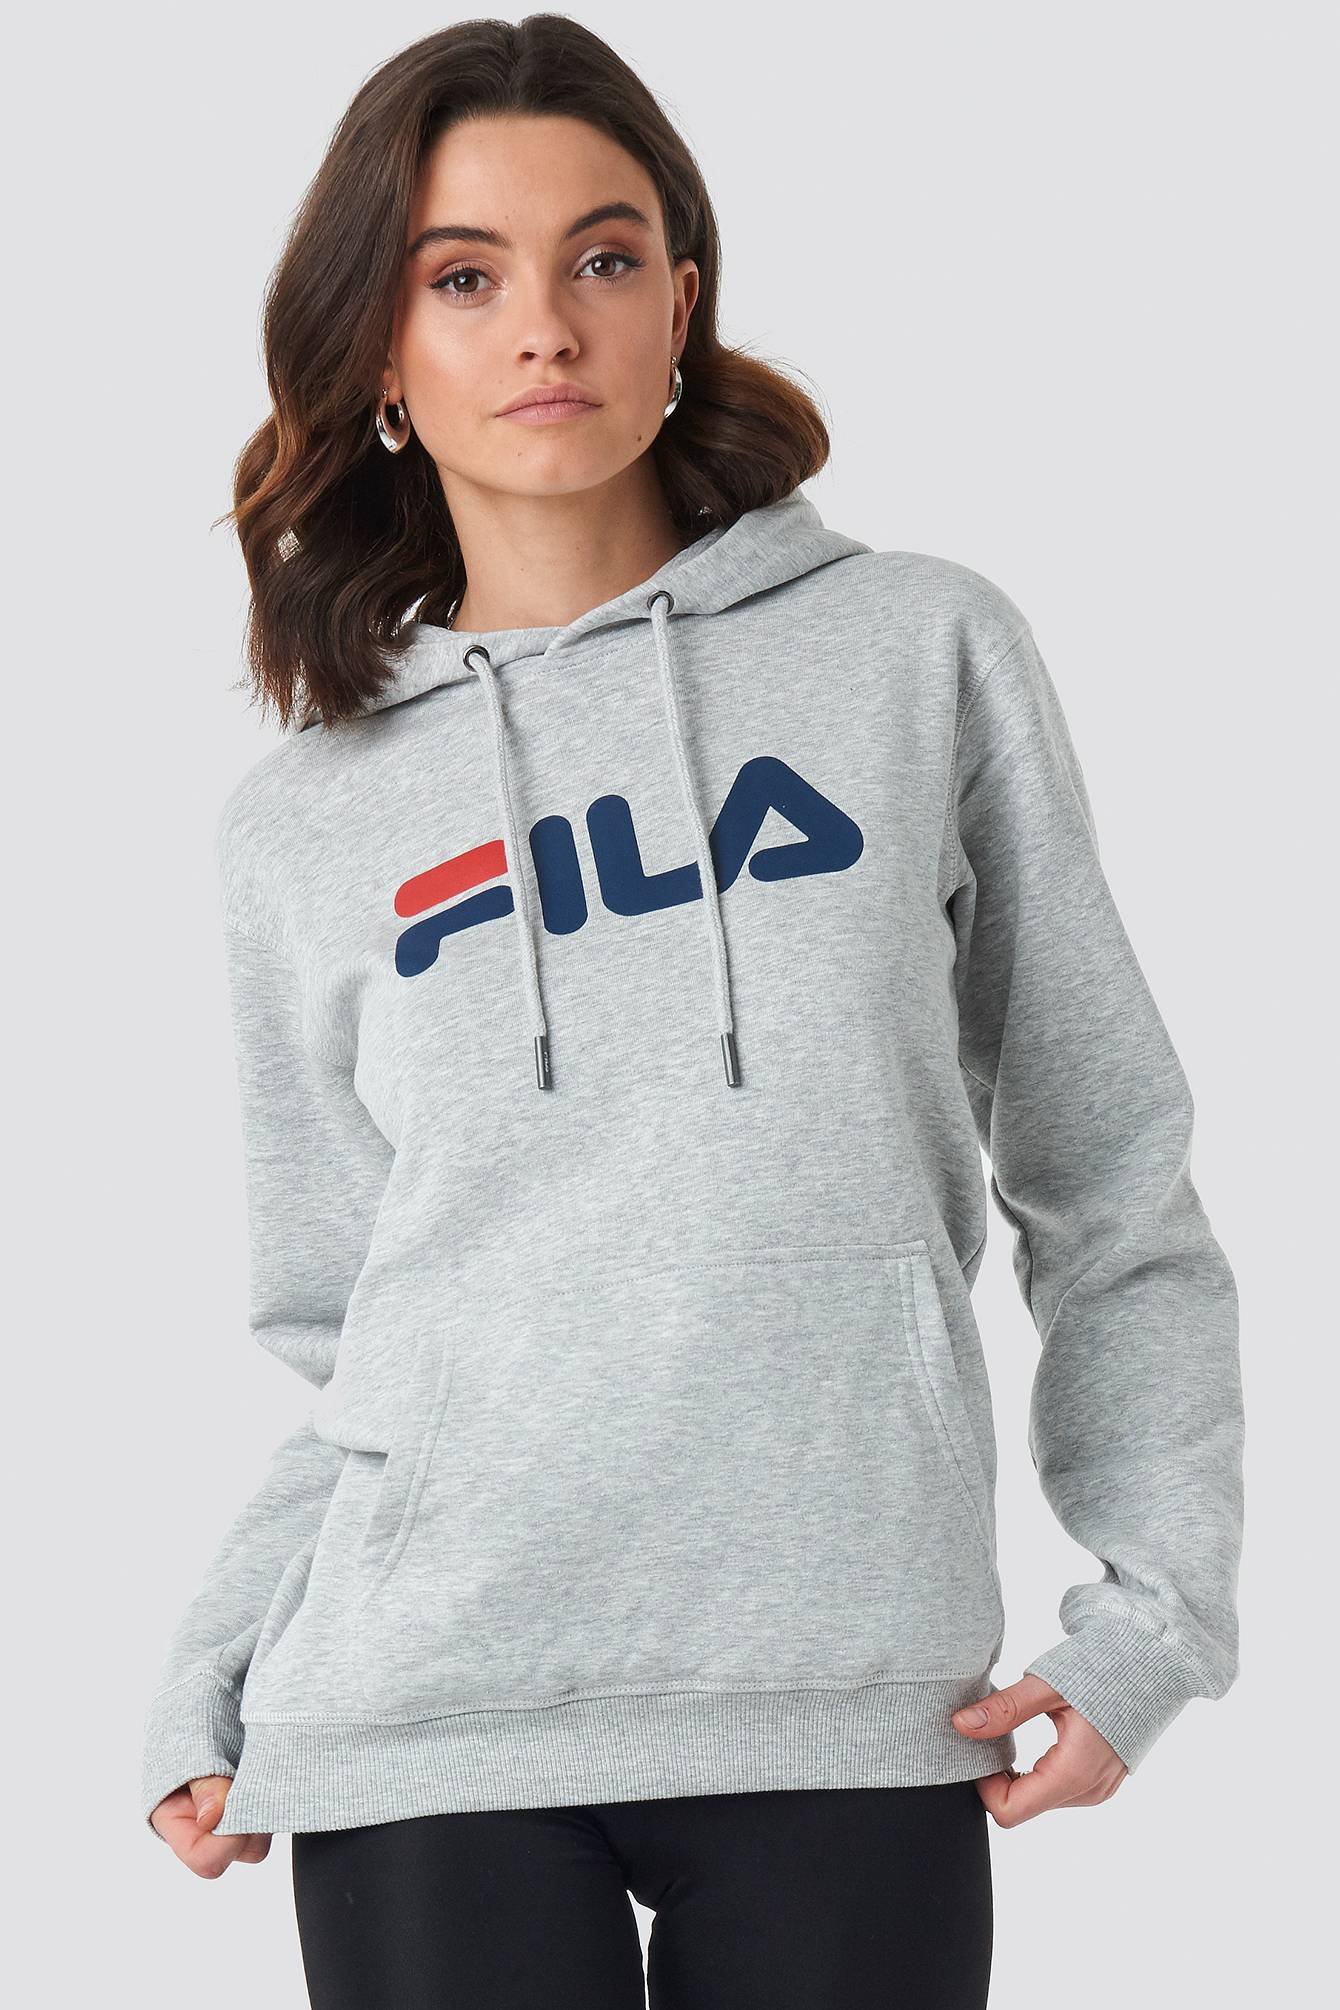 FILA Classic Pure Hoody Kangaroo - Grey